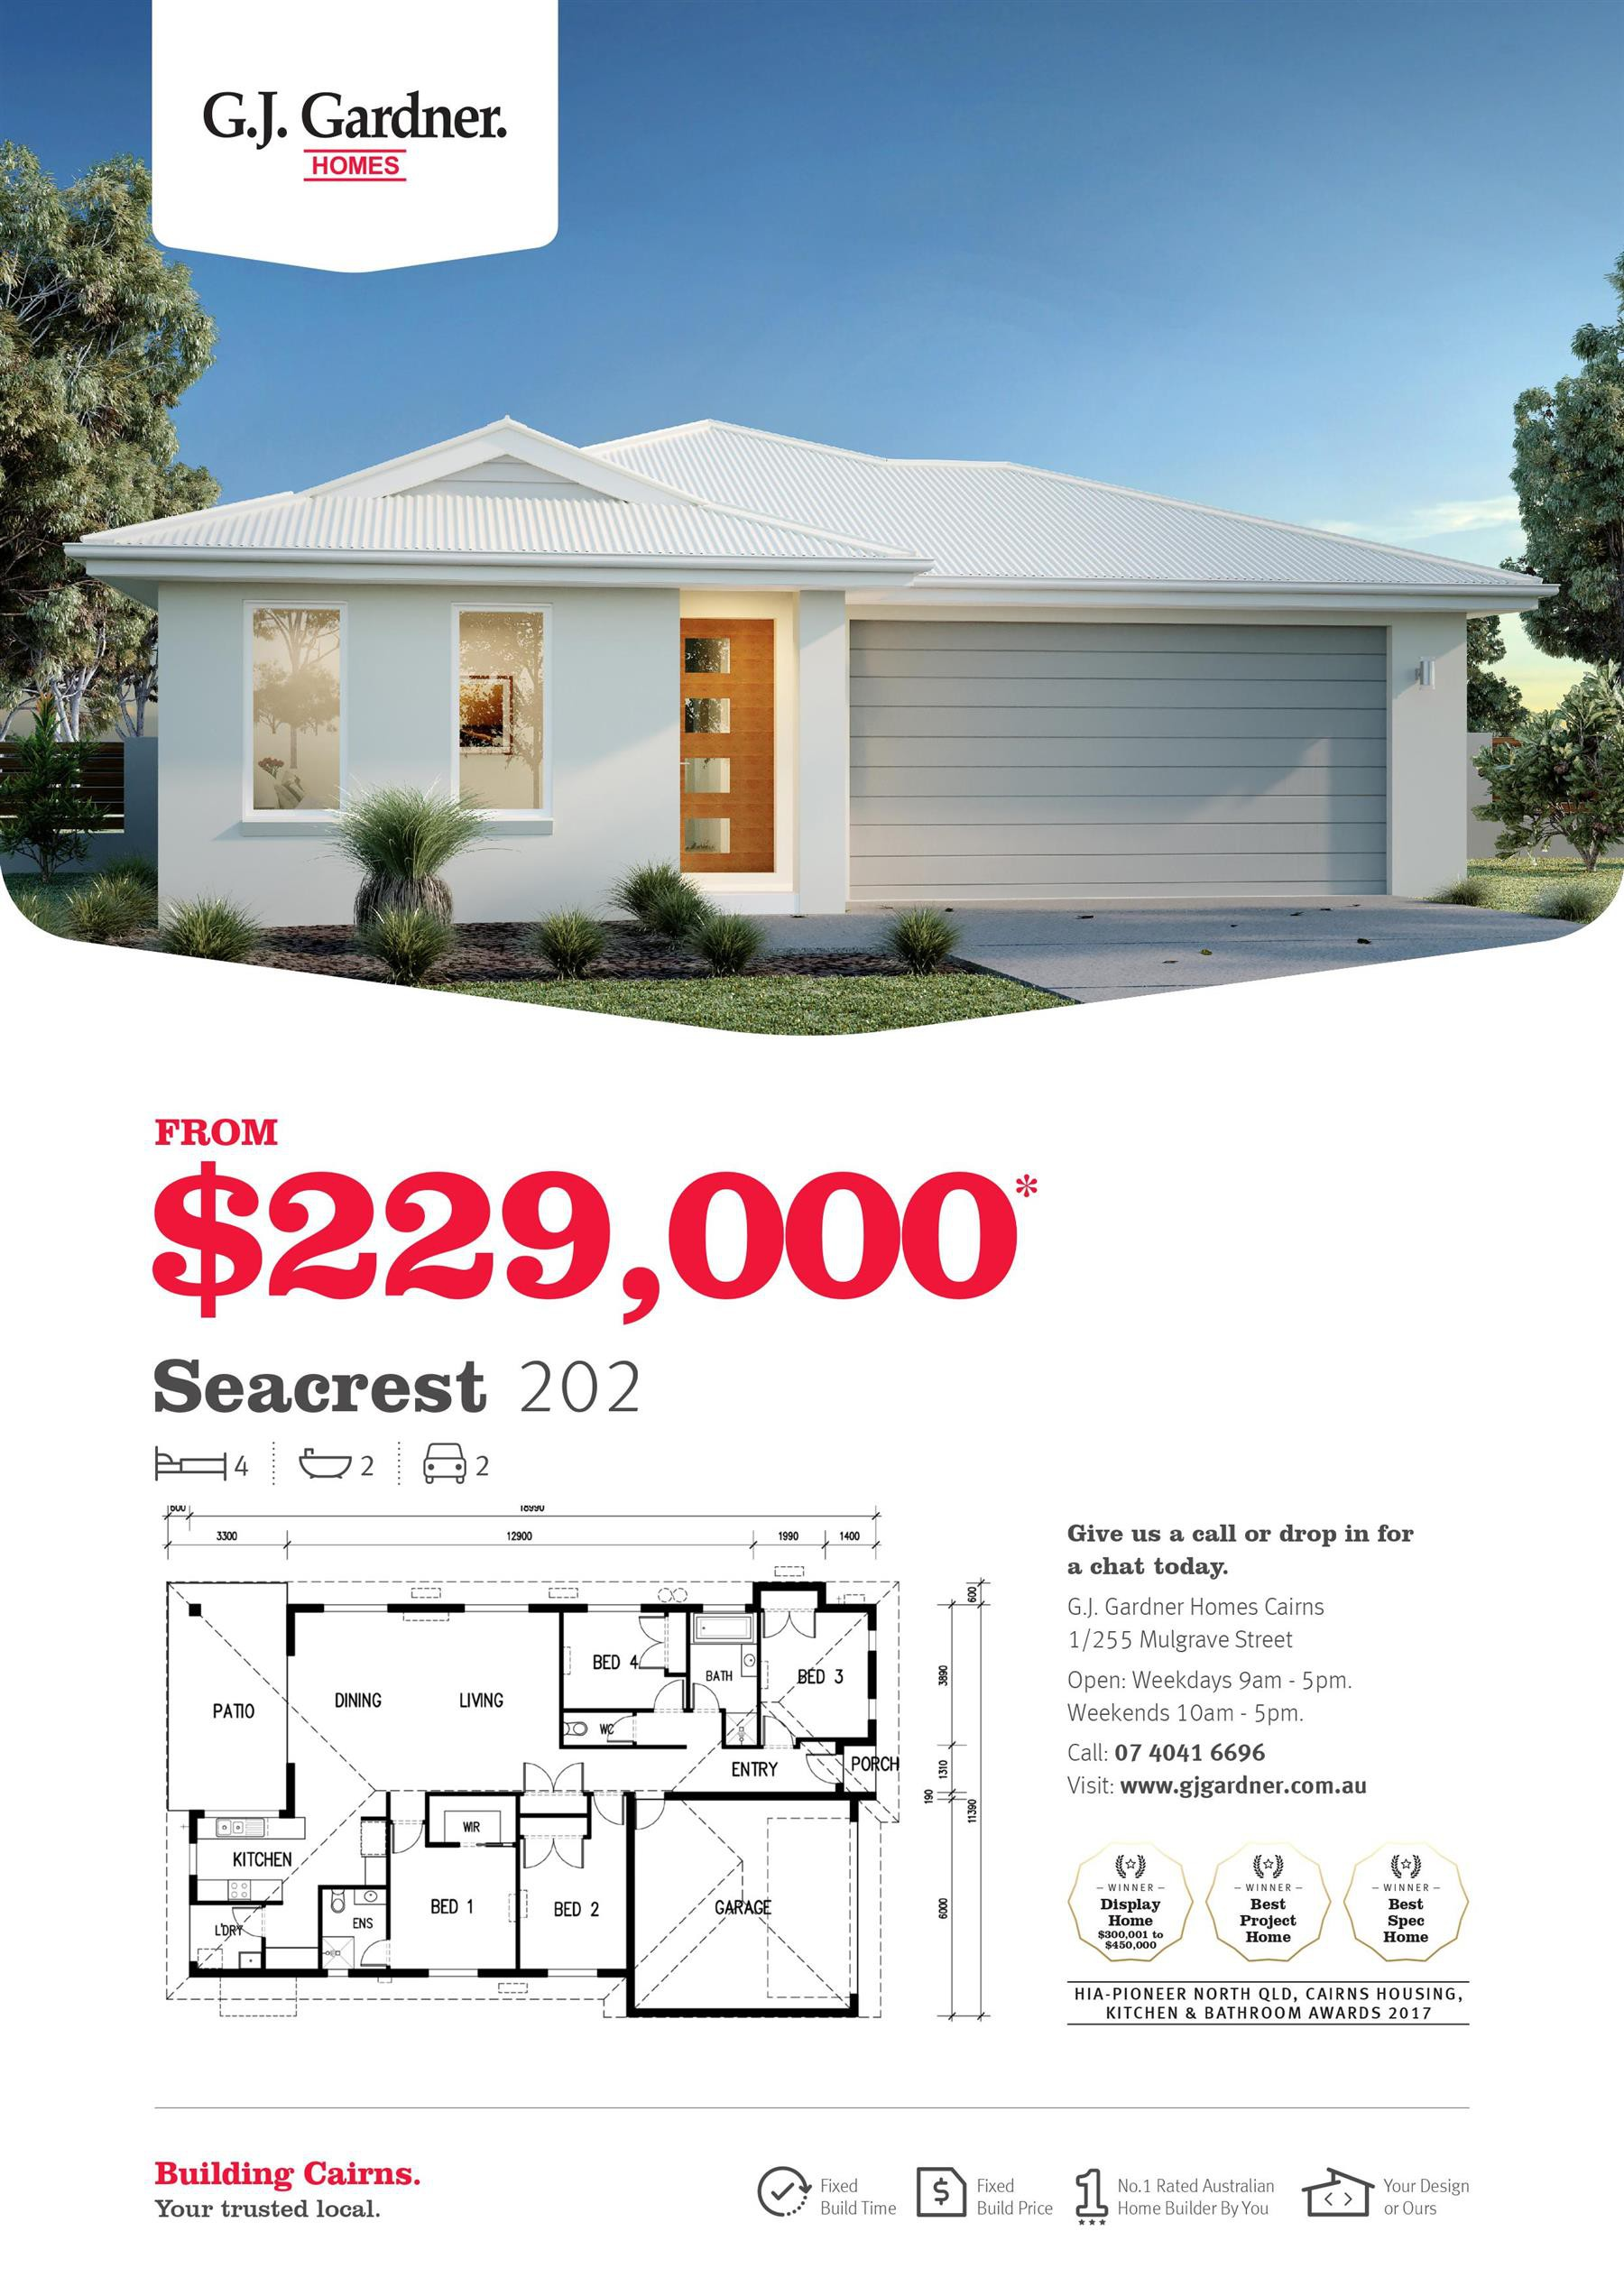 Seacrest 202 from $229,000